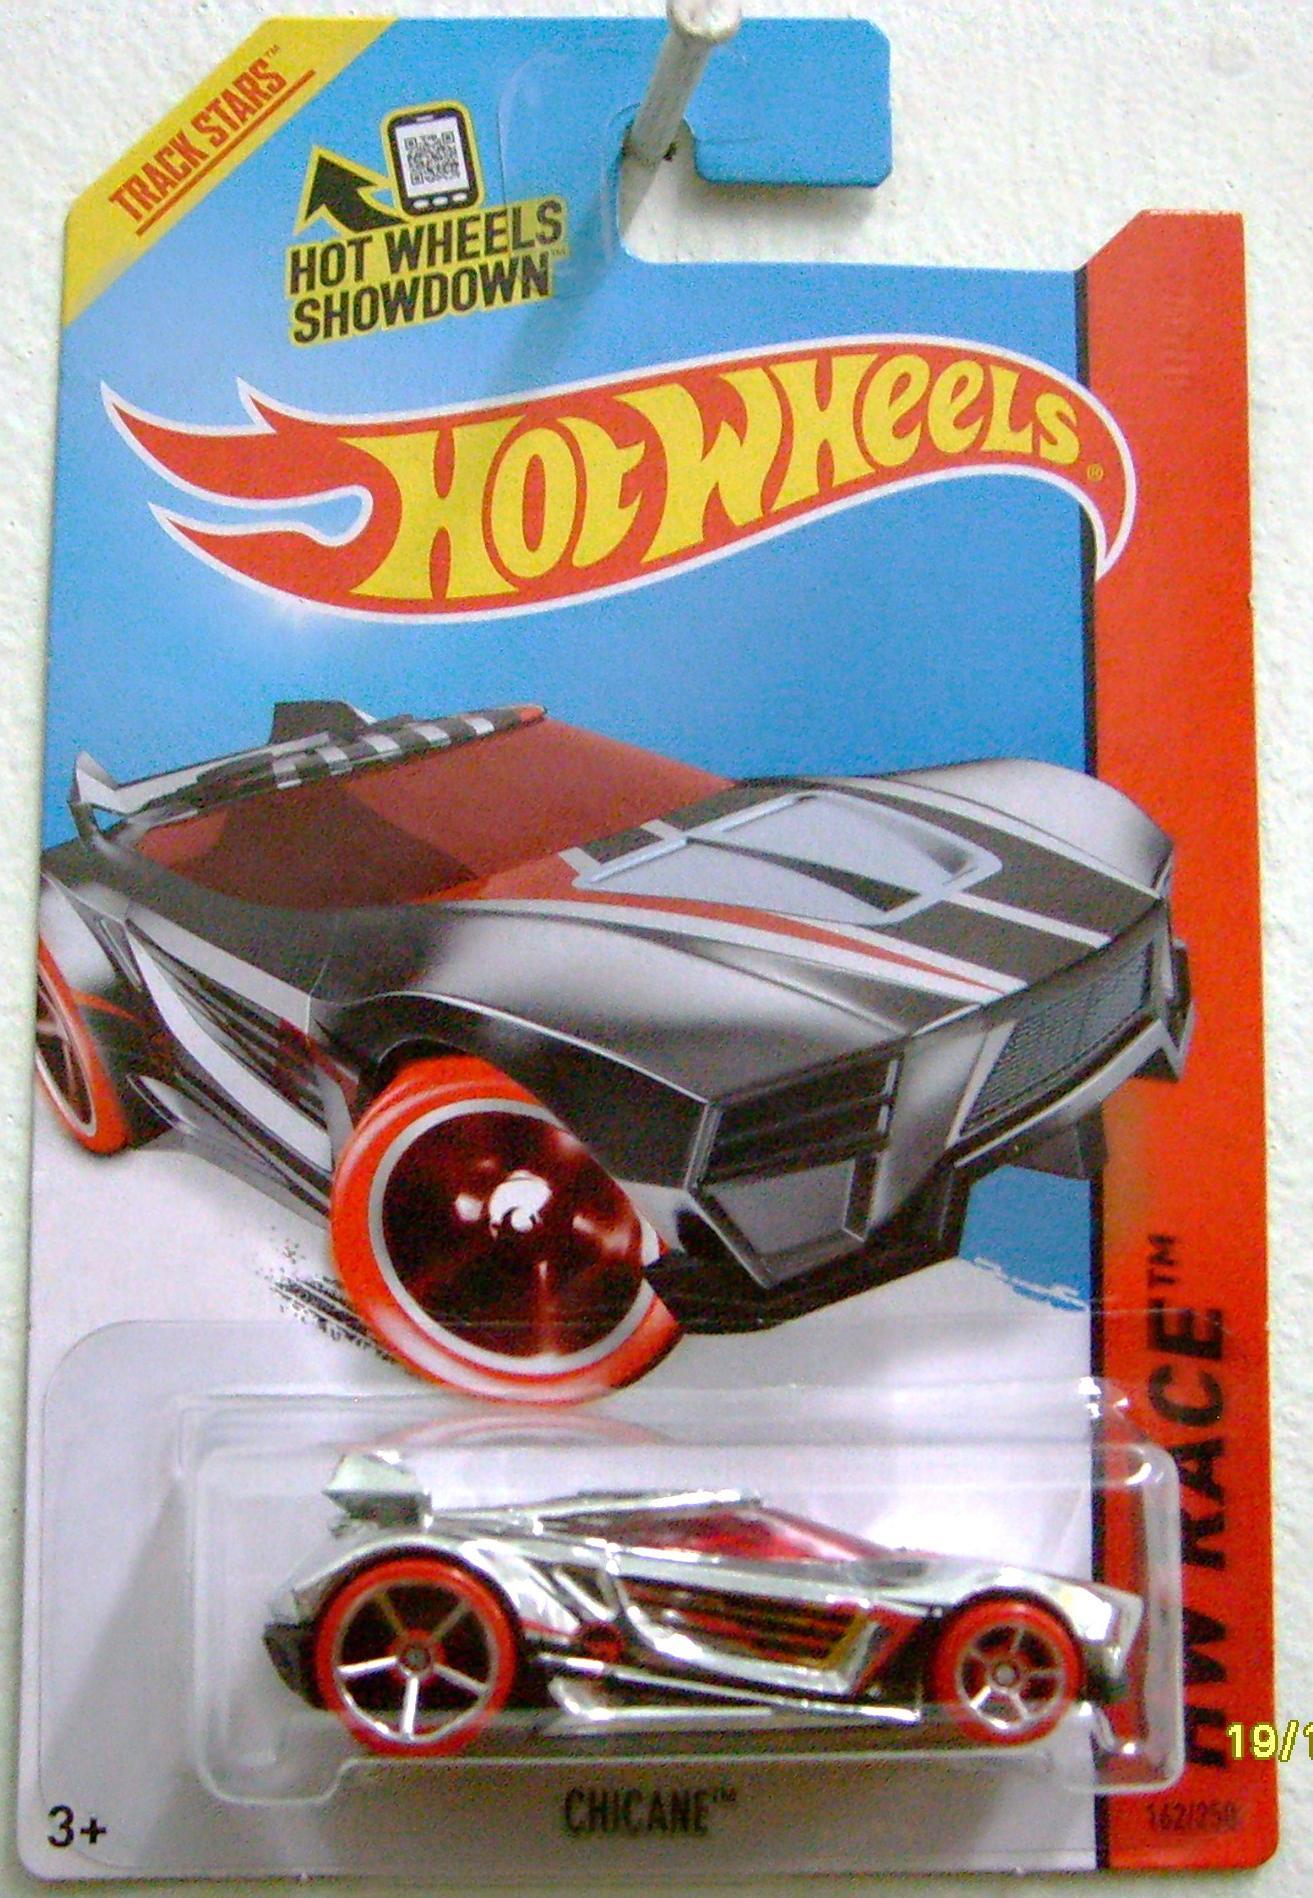 versions - Rare Hot Wheels Cars List